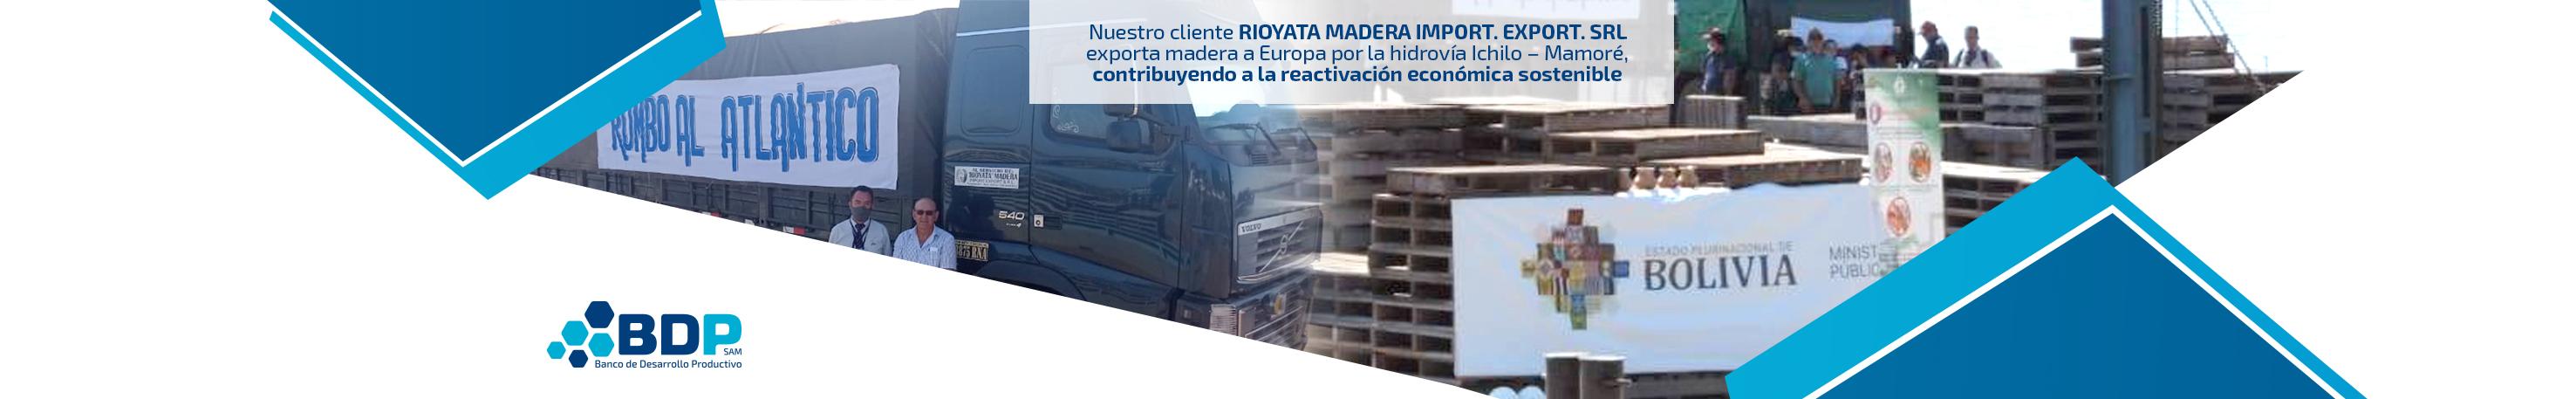 export madera